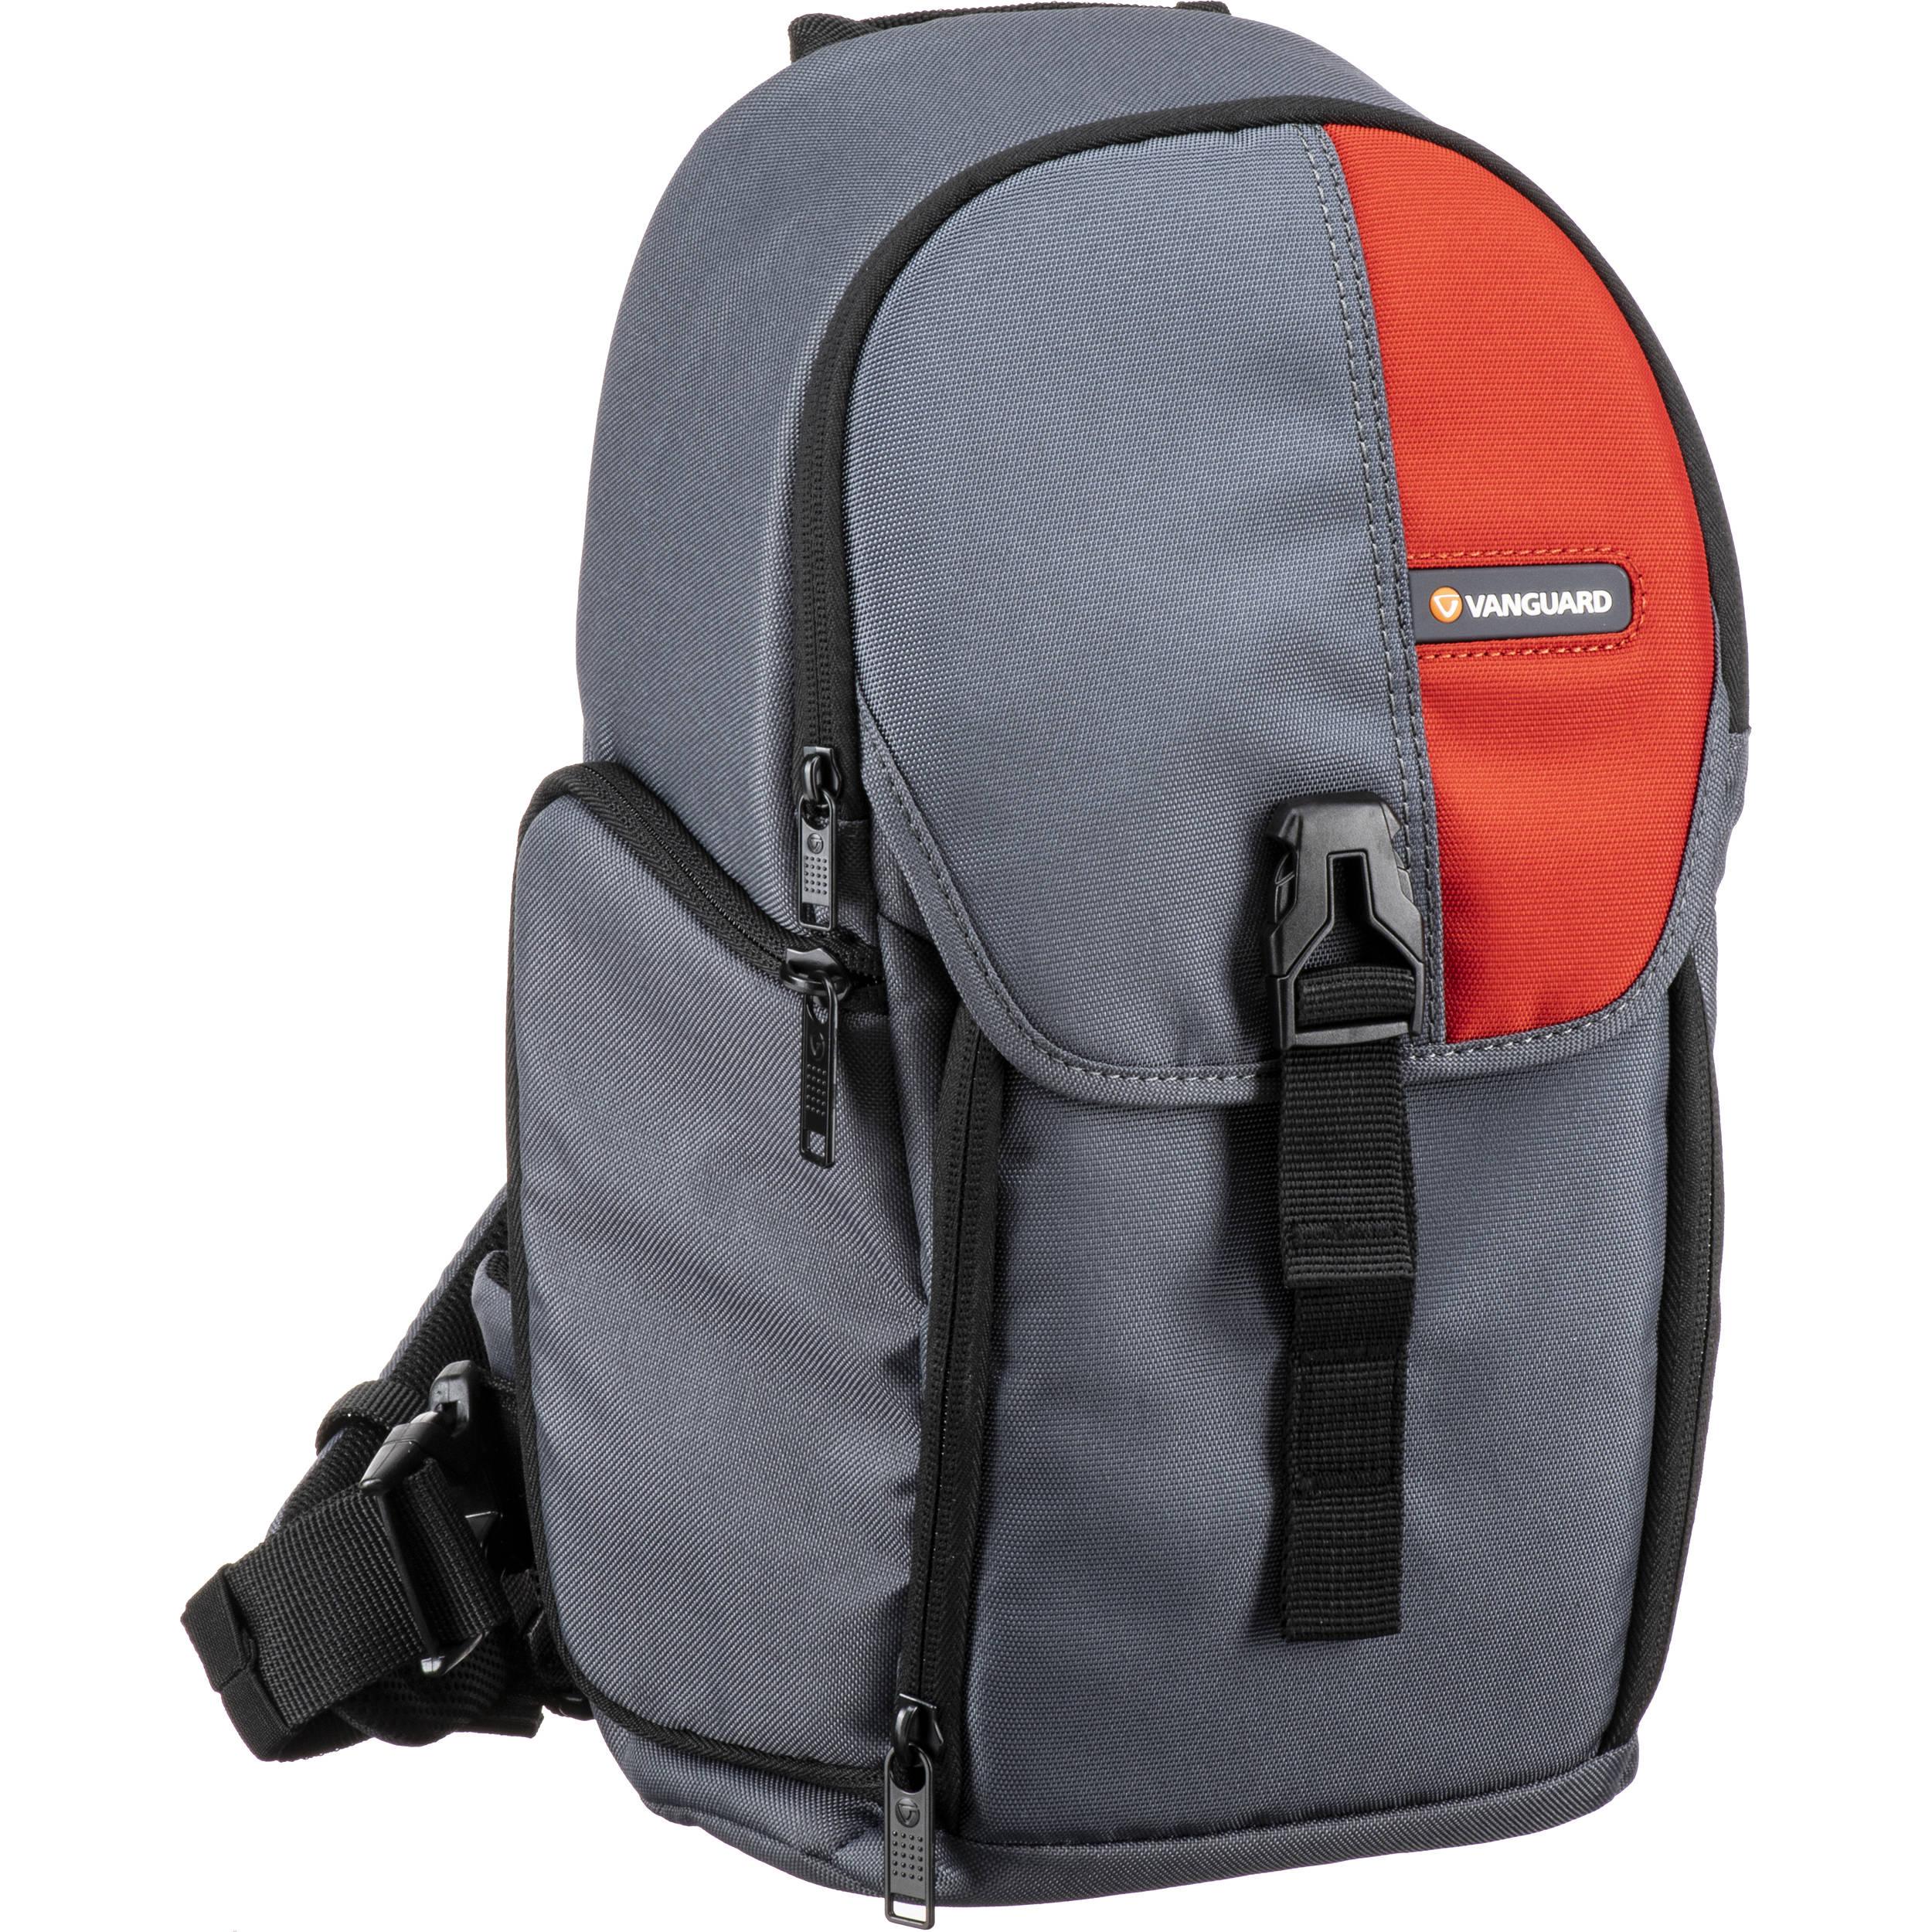 Vanguard Ziin 47 Dslr Sling Bag Orange